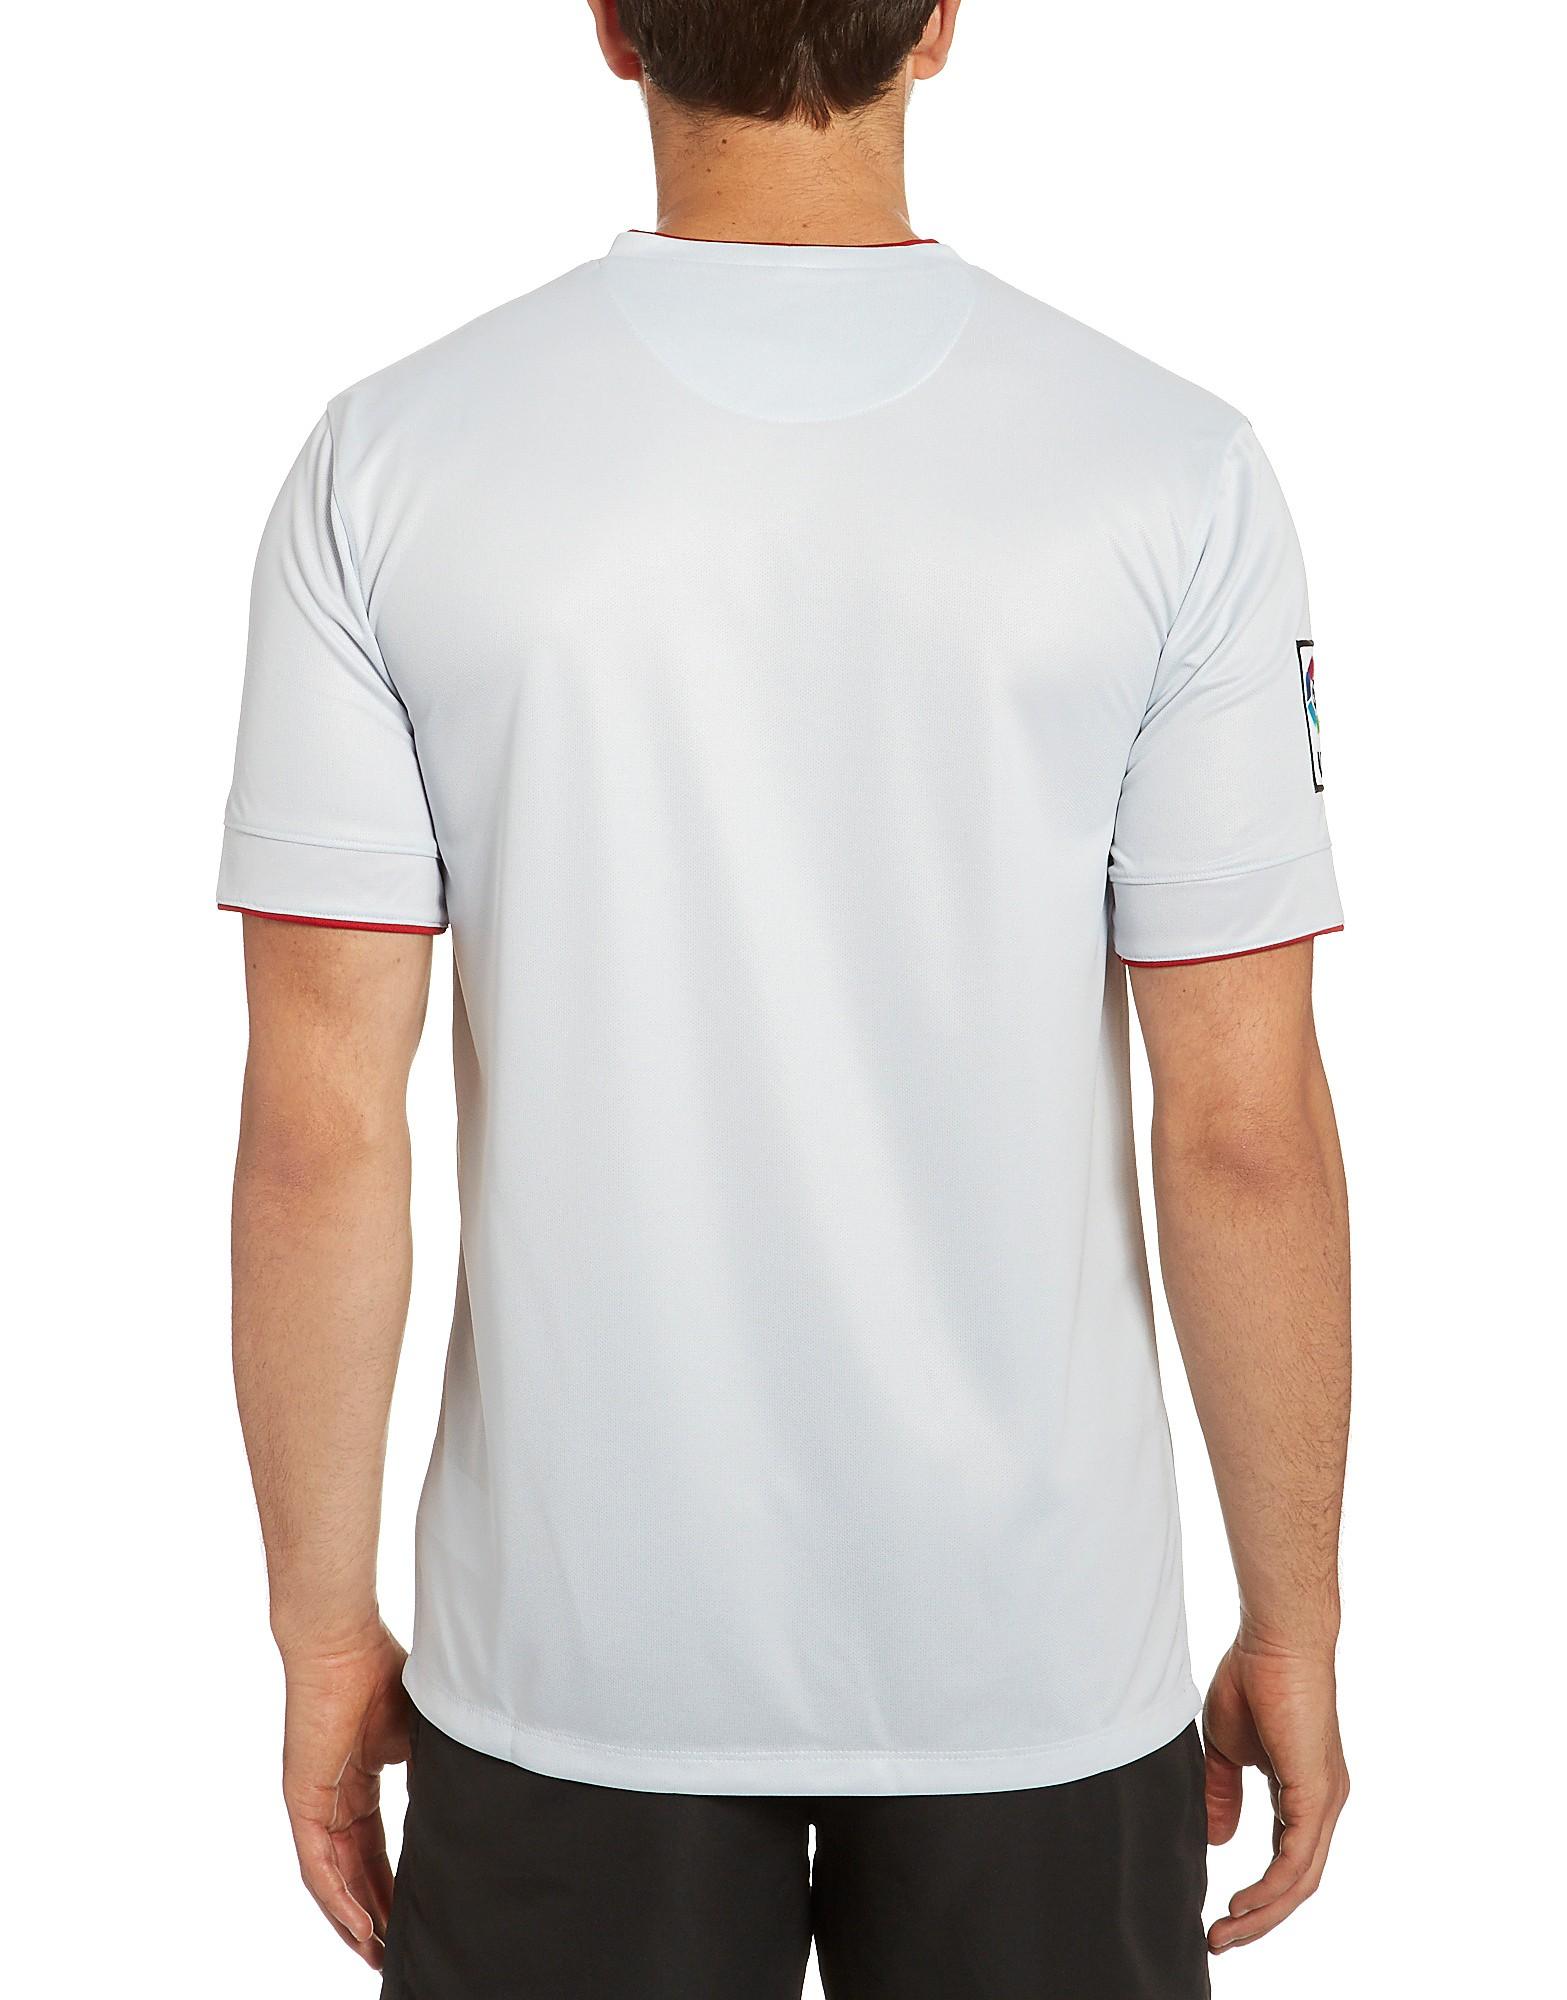 Nike Atletico Madrid 2014 Away Shirt